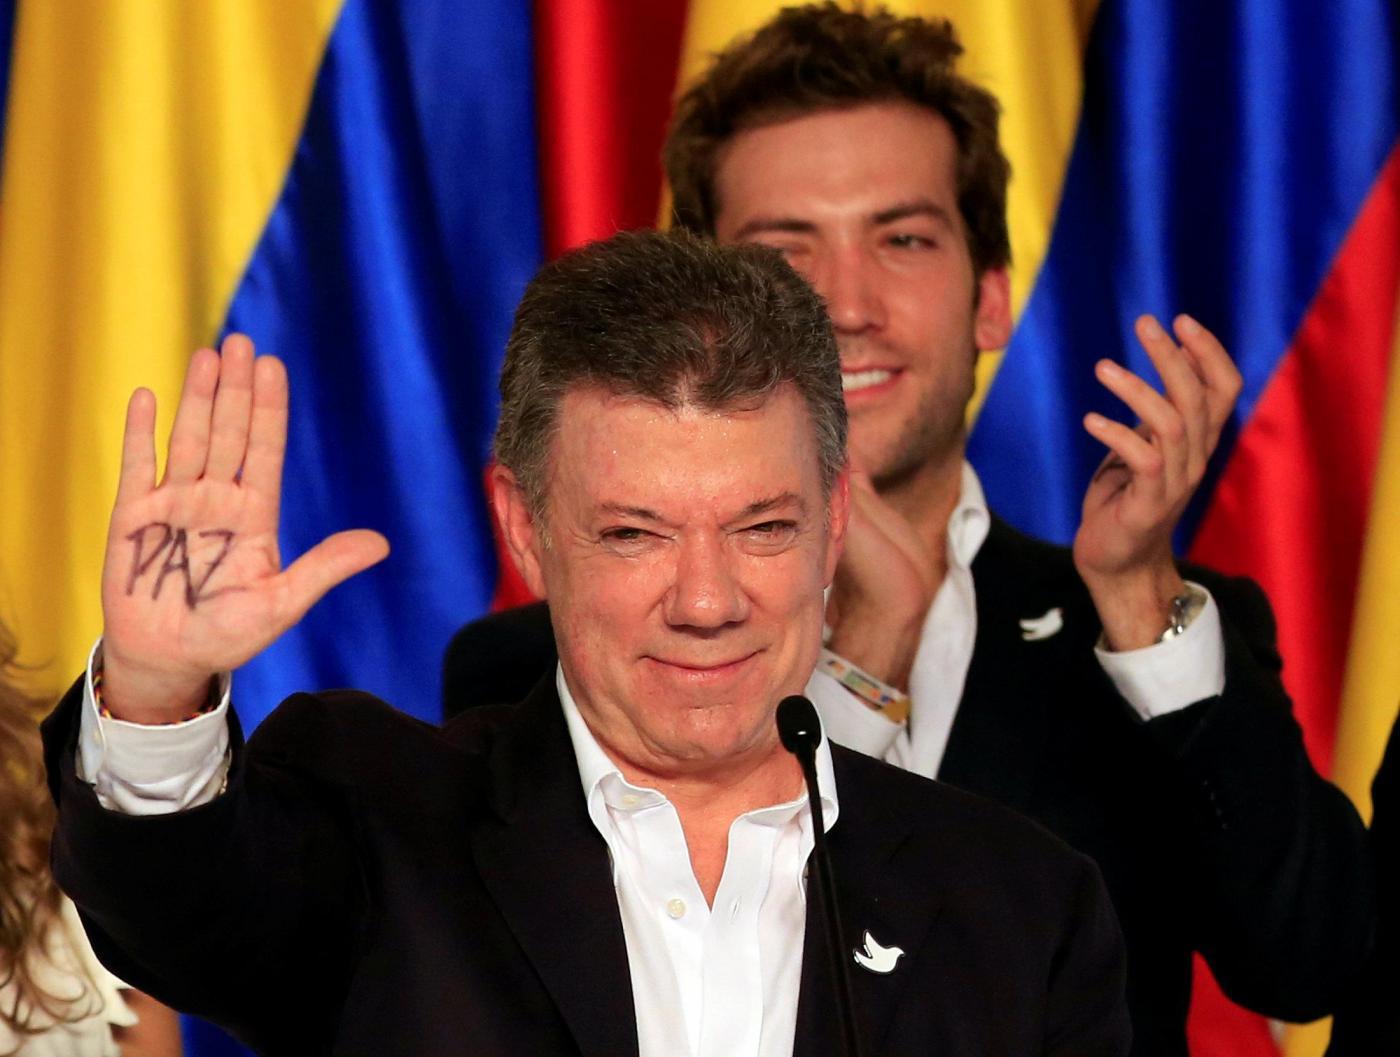 Chi è Juan Manuel Santos, Premio Nobel per la Pace 2016